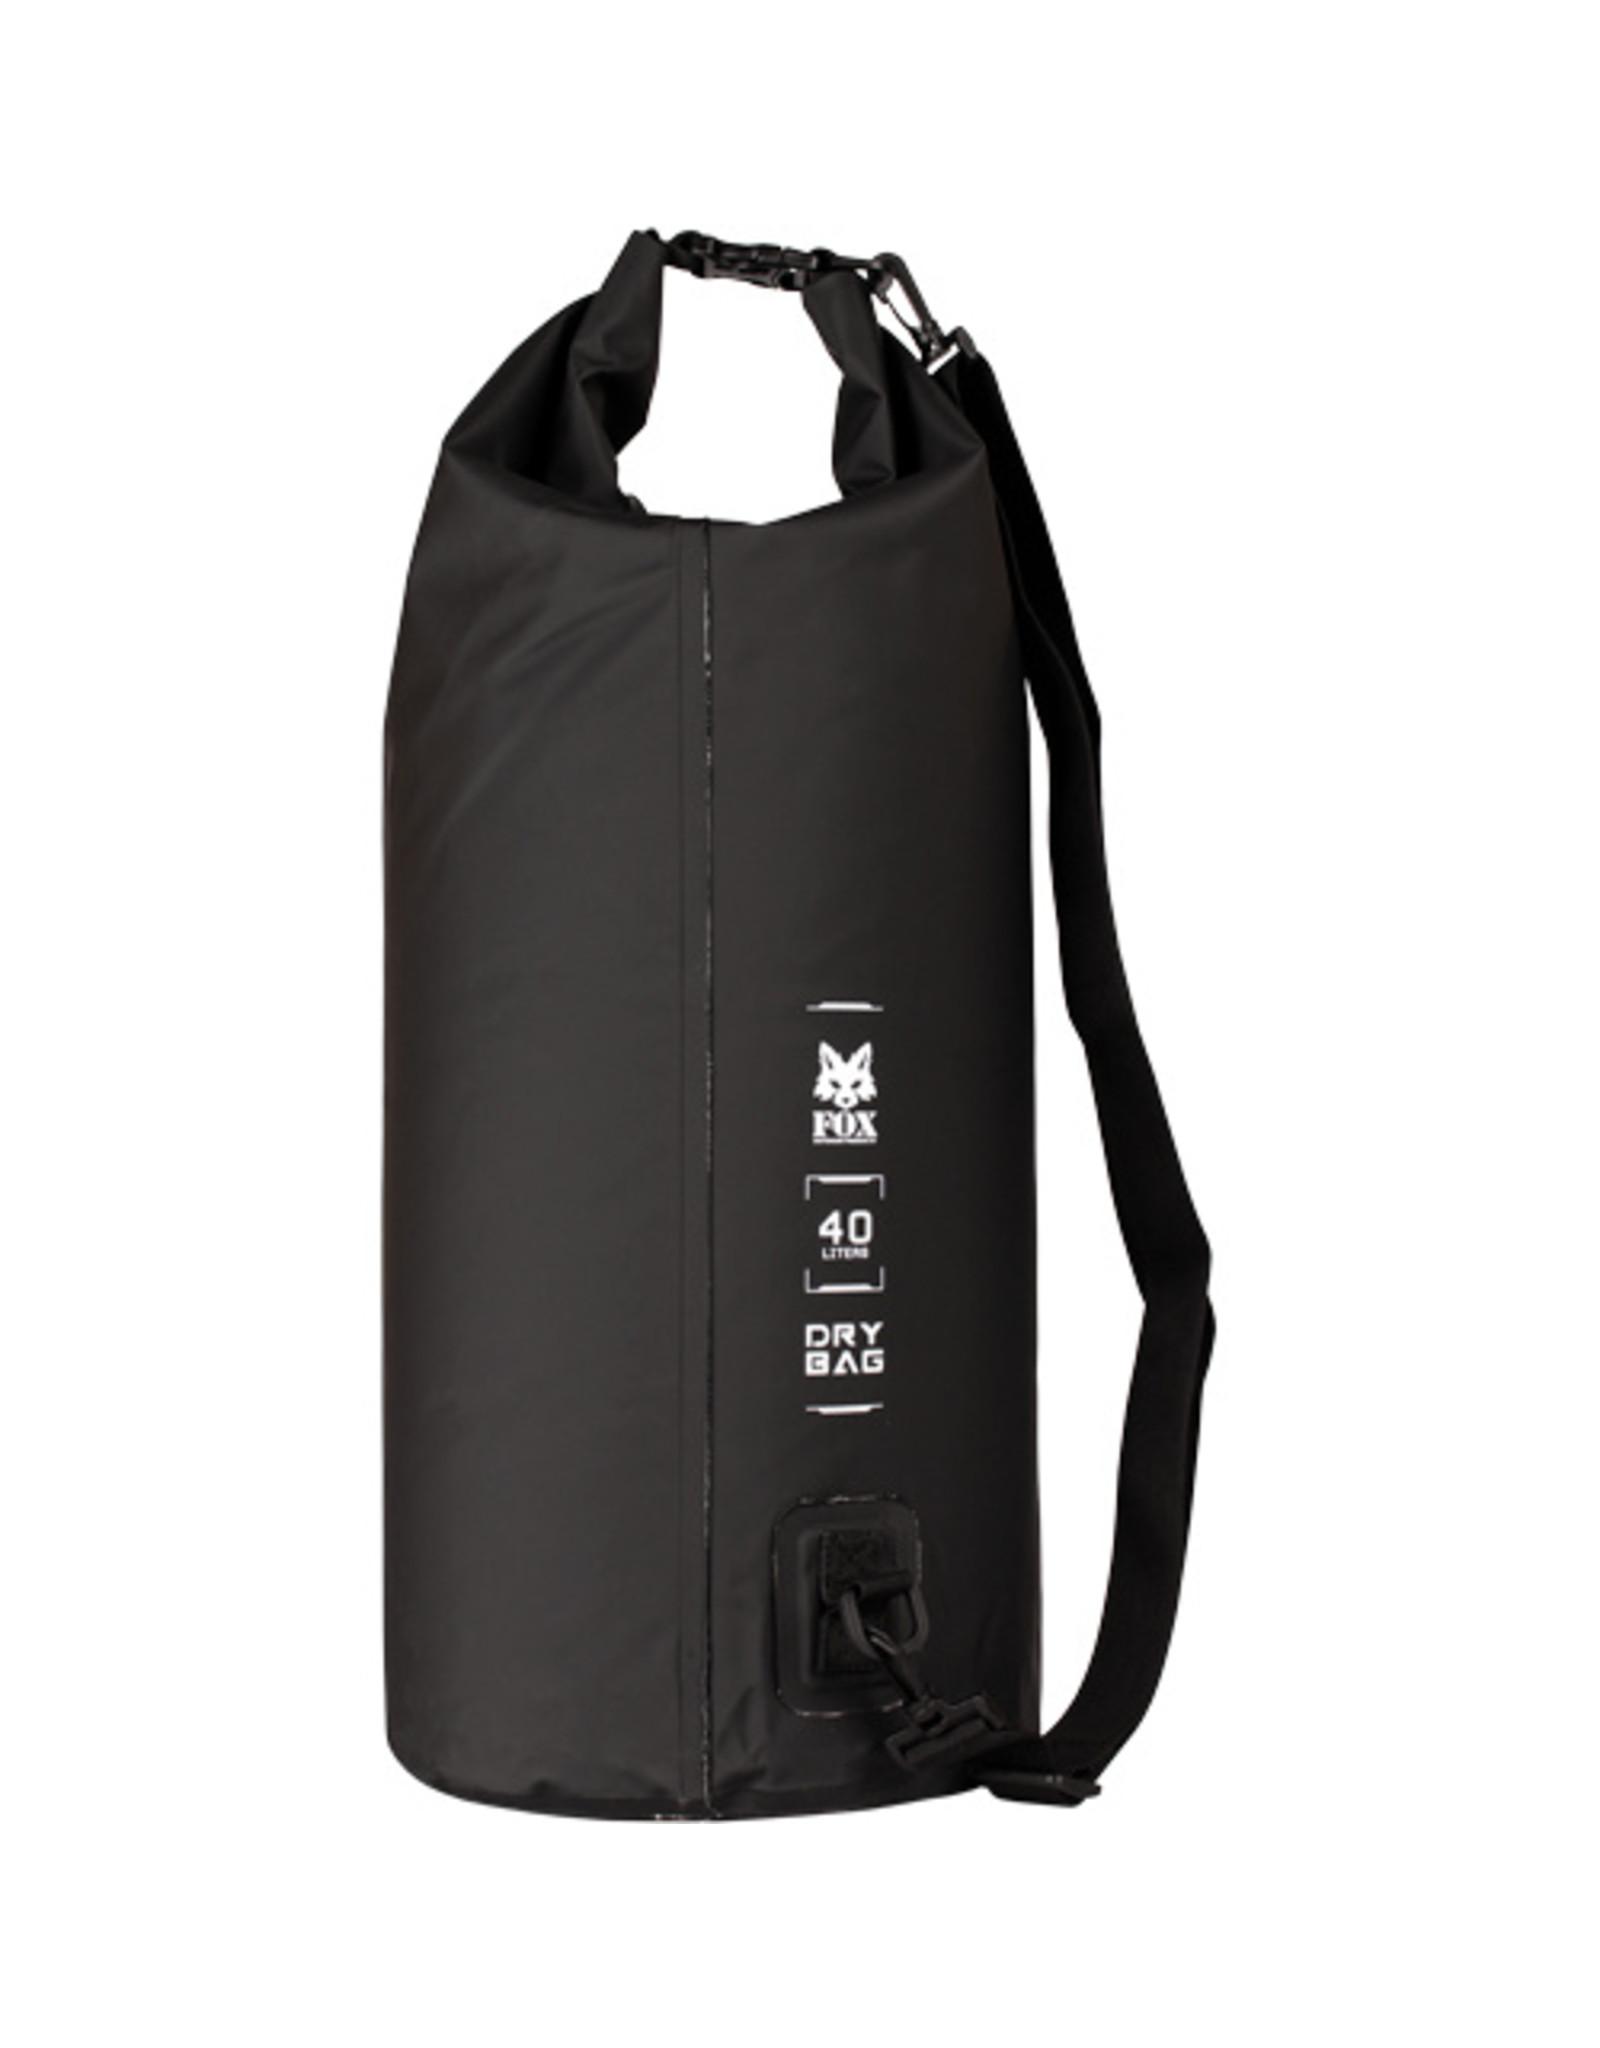 FOX TACTICAL GEAR SUPER HEAVY WEIGHT DRY BAG 40L